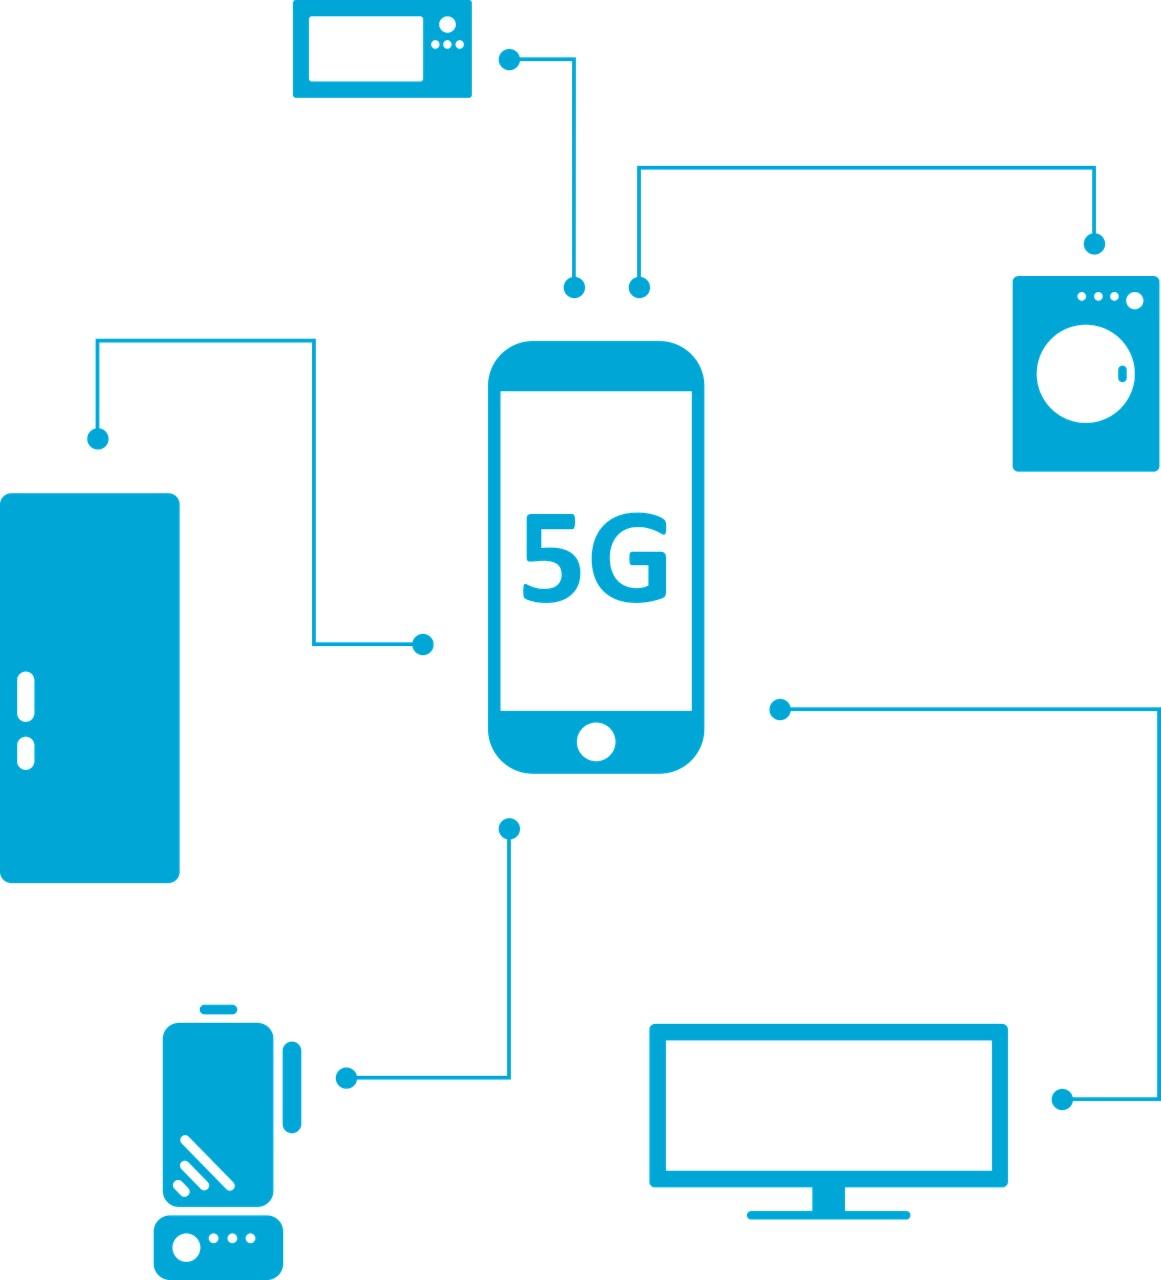 Wilson Center: North America 5G deployment lacks security, regulatory vision